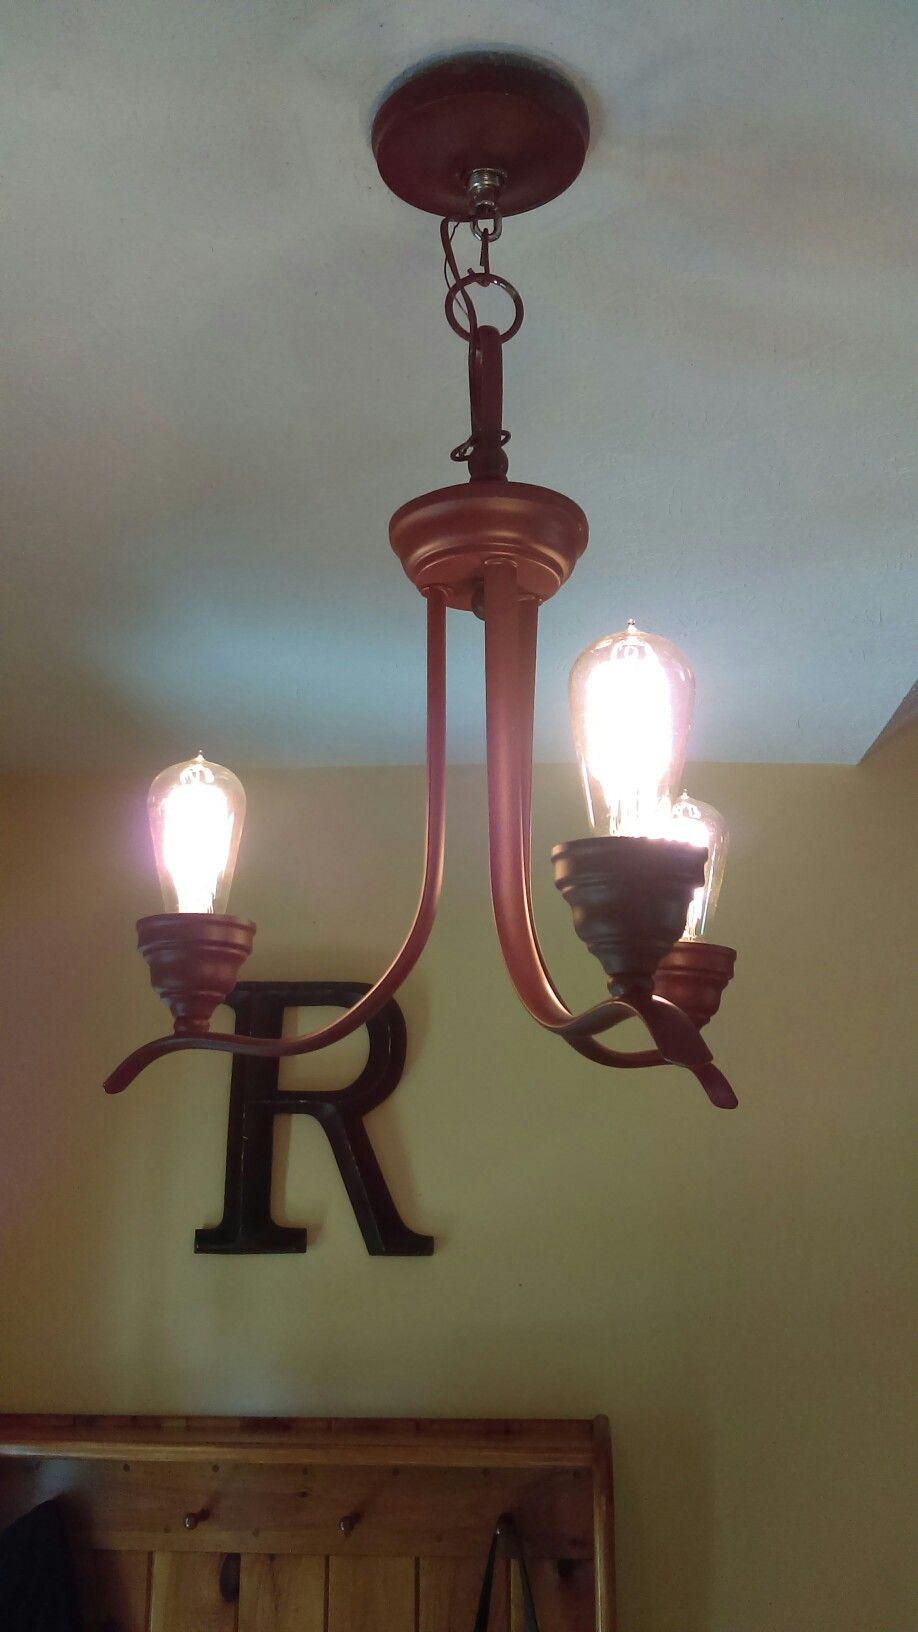 Primer Spray Painted Chandelier Formerly Chrome Wirh Edision Birdcage Lightbulbs Original Plan Was To